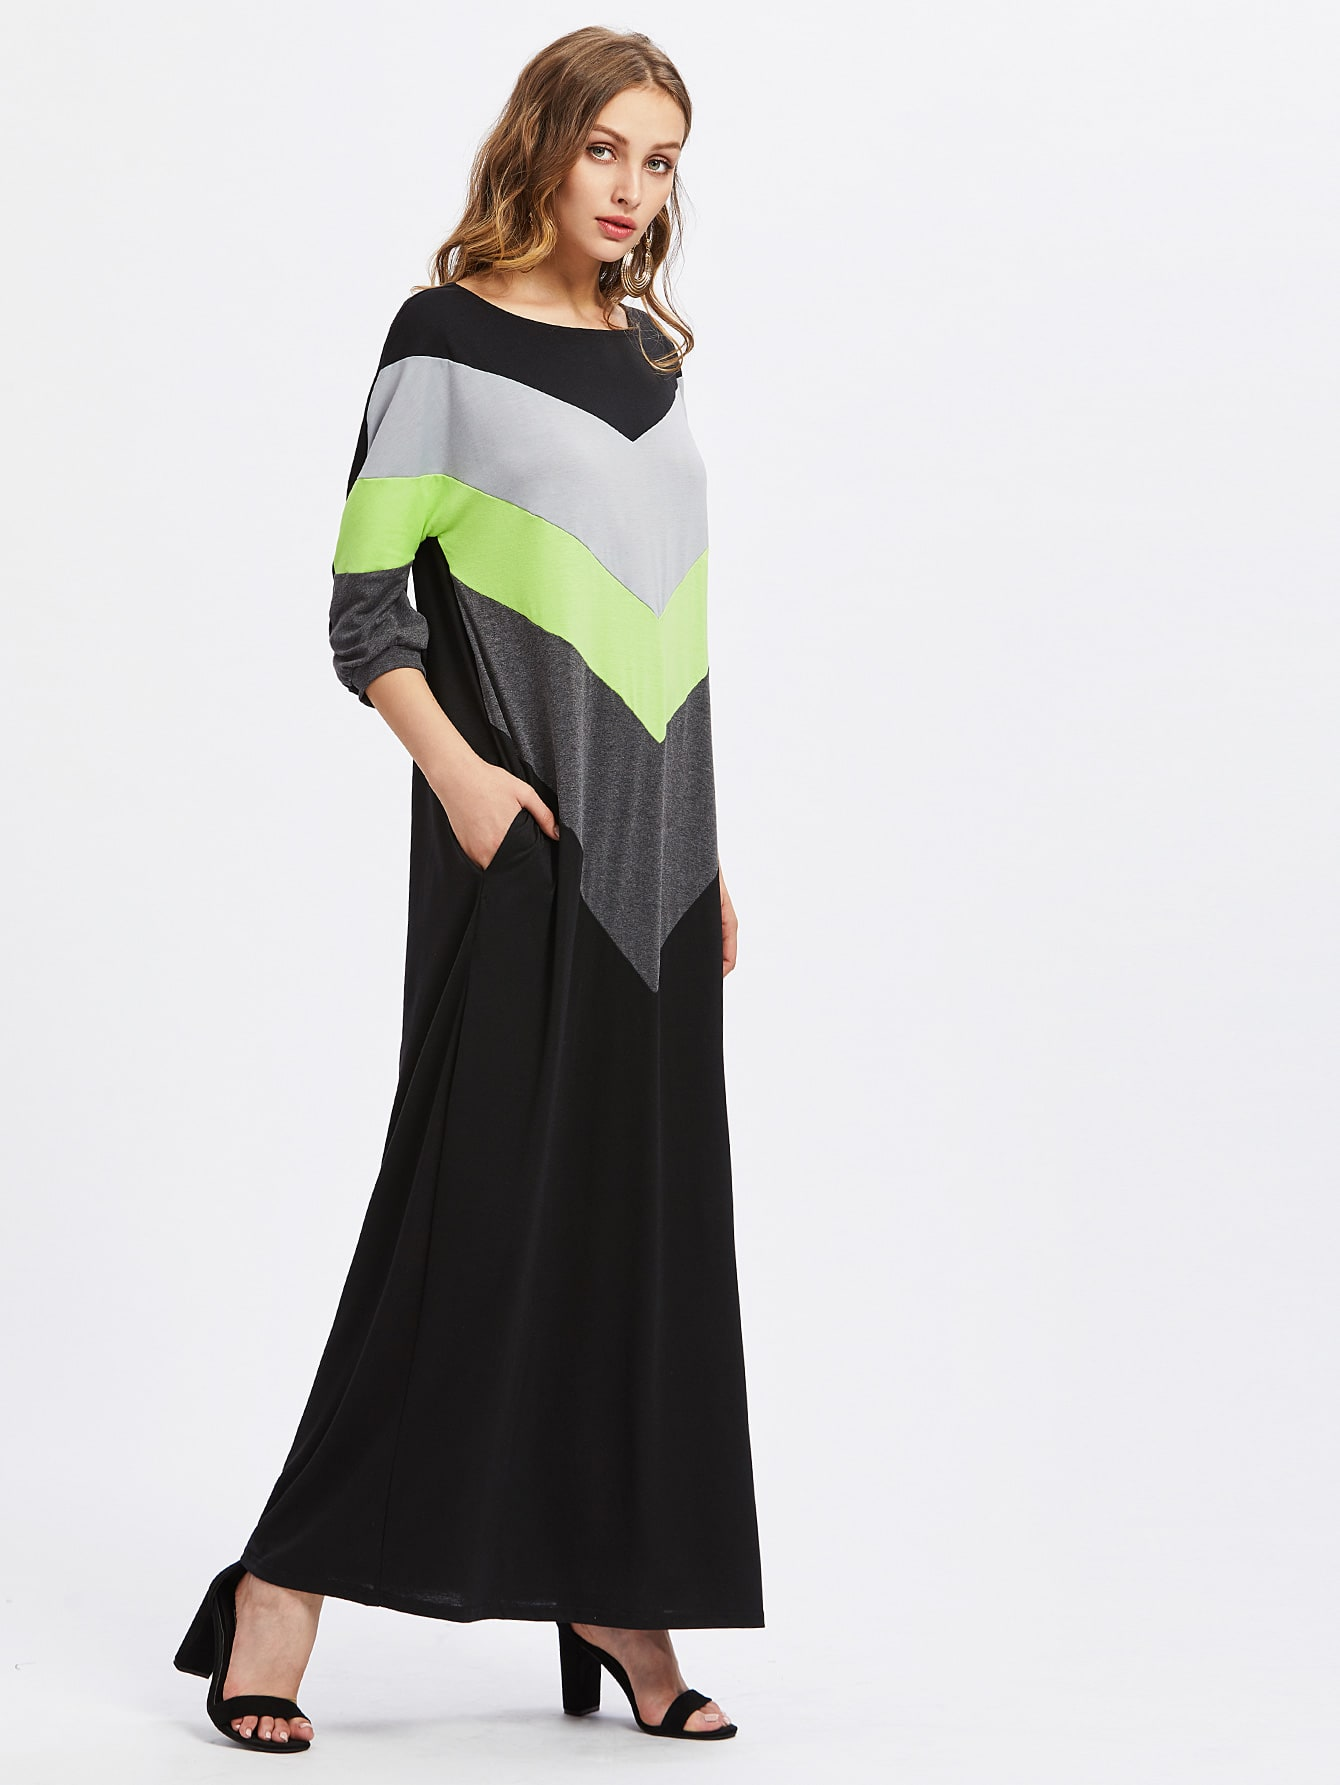 Contrast Cut And Sew Chevron Full Length Dress